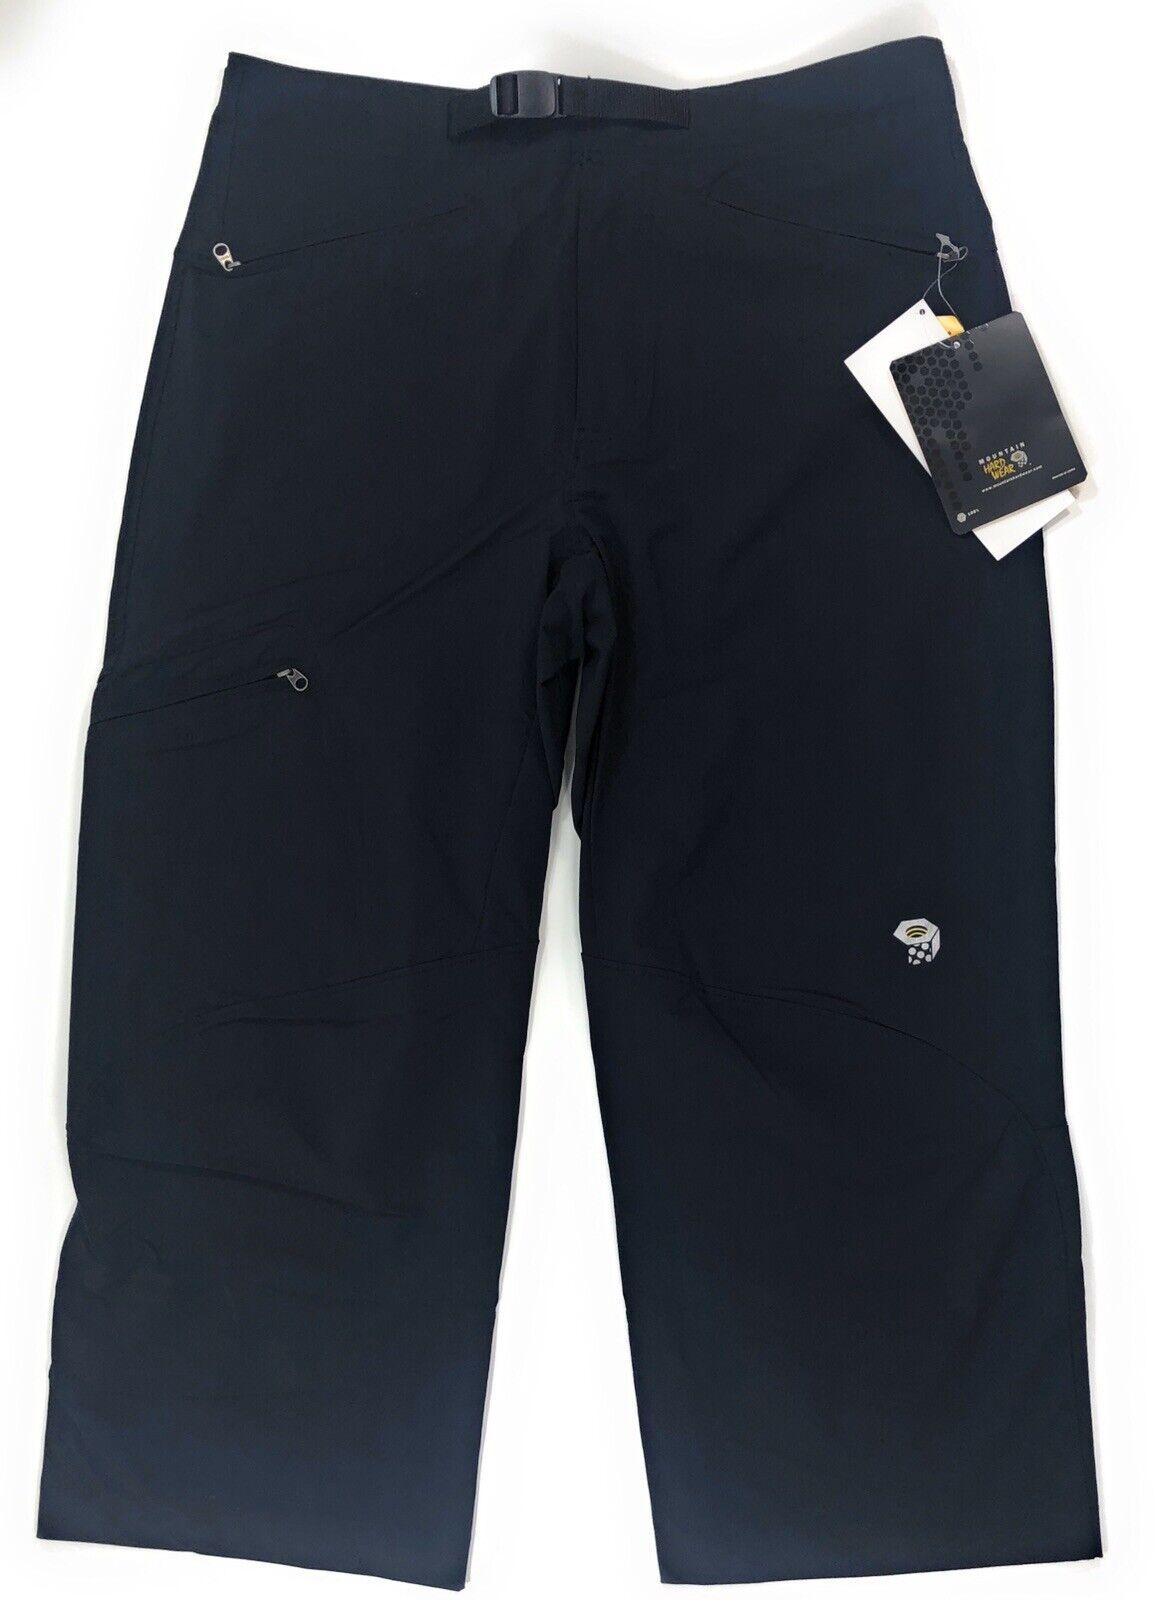 Mountain Hardwear Silcox 3/4 Pants Mens Small Outdoor Hiking